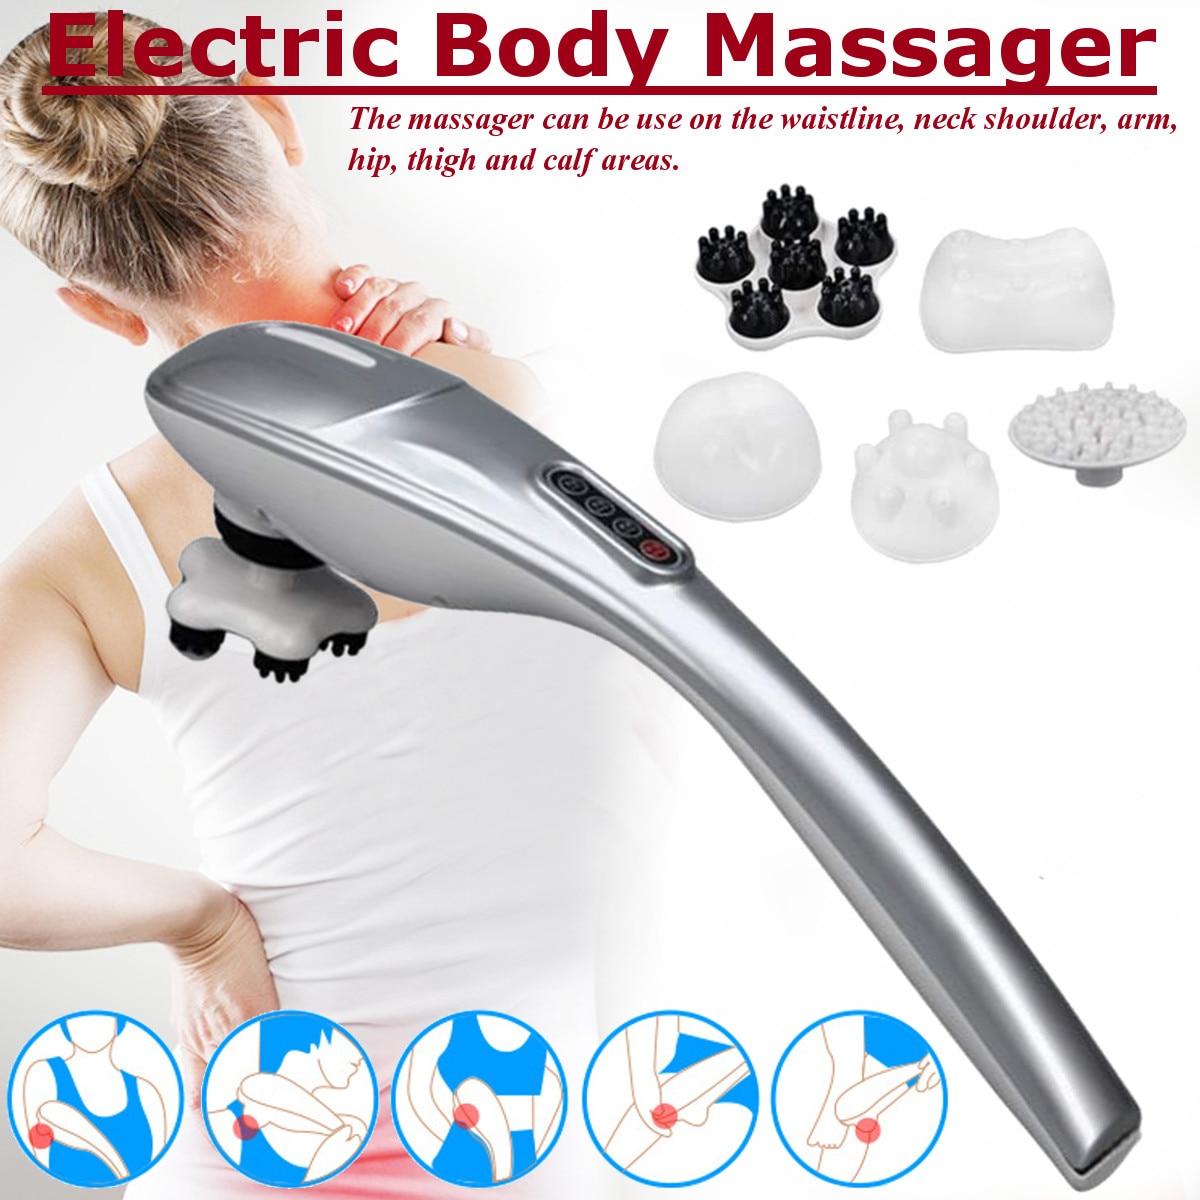 5 In 1 Electric Neck Massager Hammer Infrared Massage Back Relax Waist Knocking Handheld Vibrator Cervical